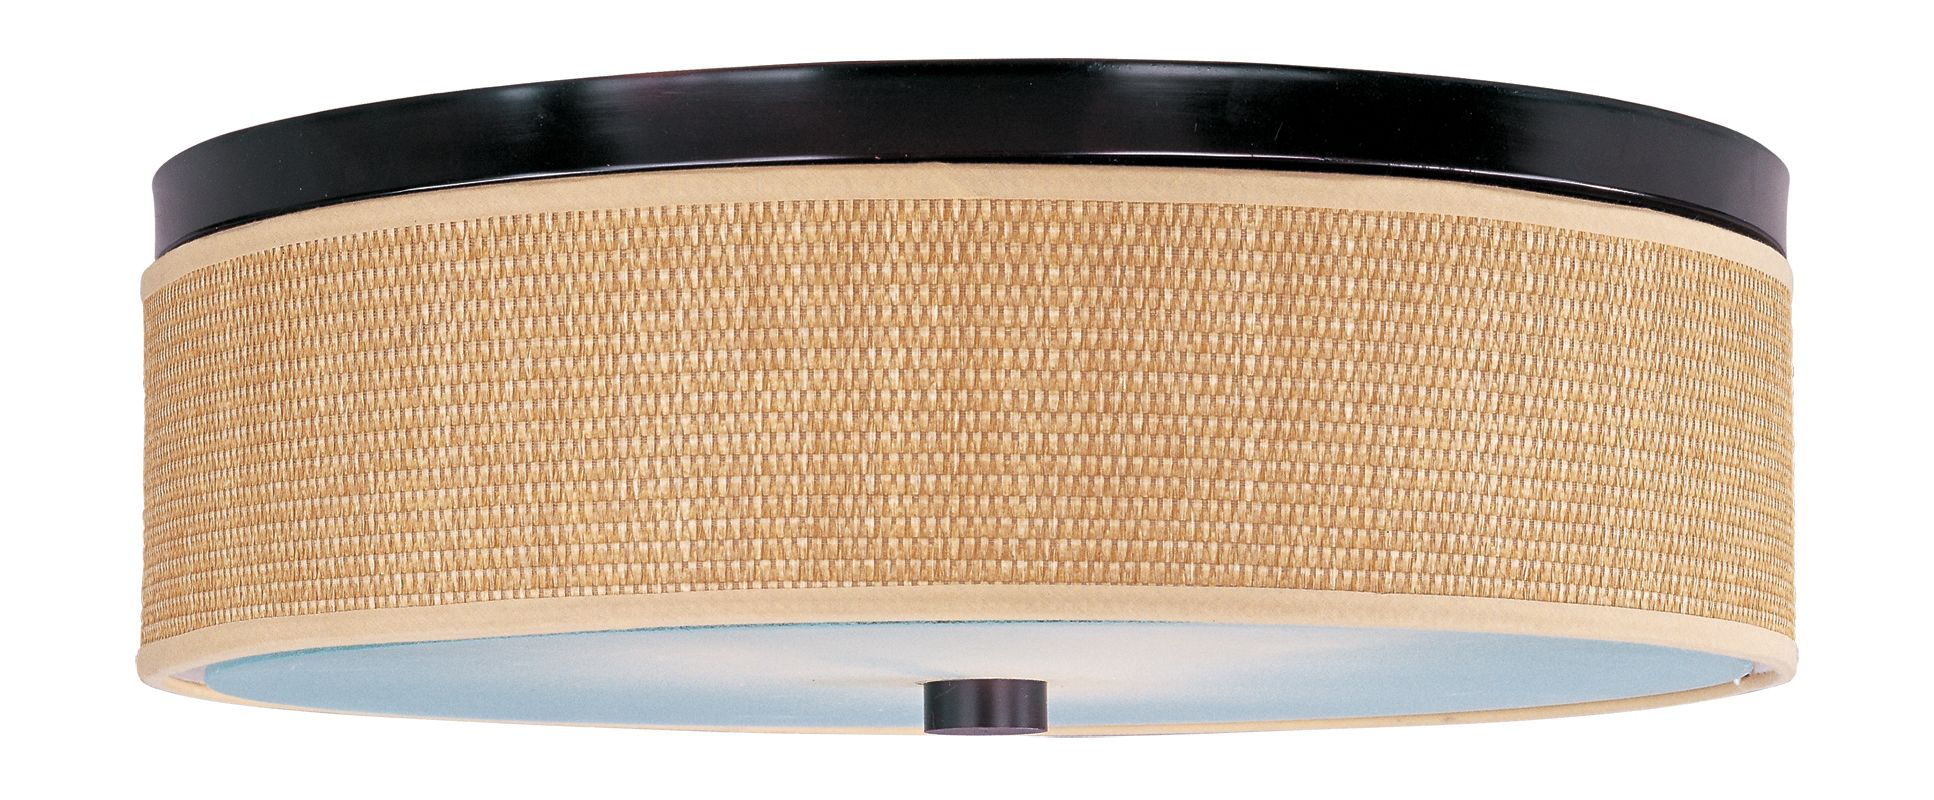 Shop Portfolio 3 Light Vassar Brushed Nickel Bathroom: ET2 E95004-101OI Oil Rubbed Bronze Elements 3-Bulb Flush